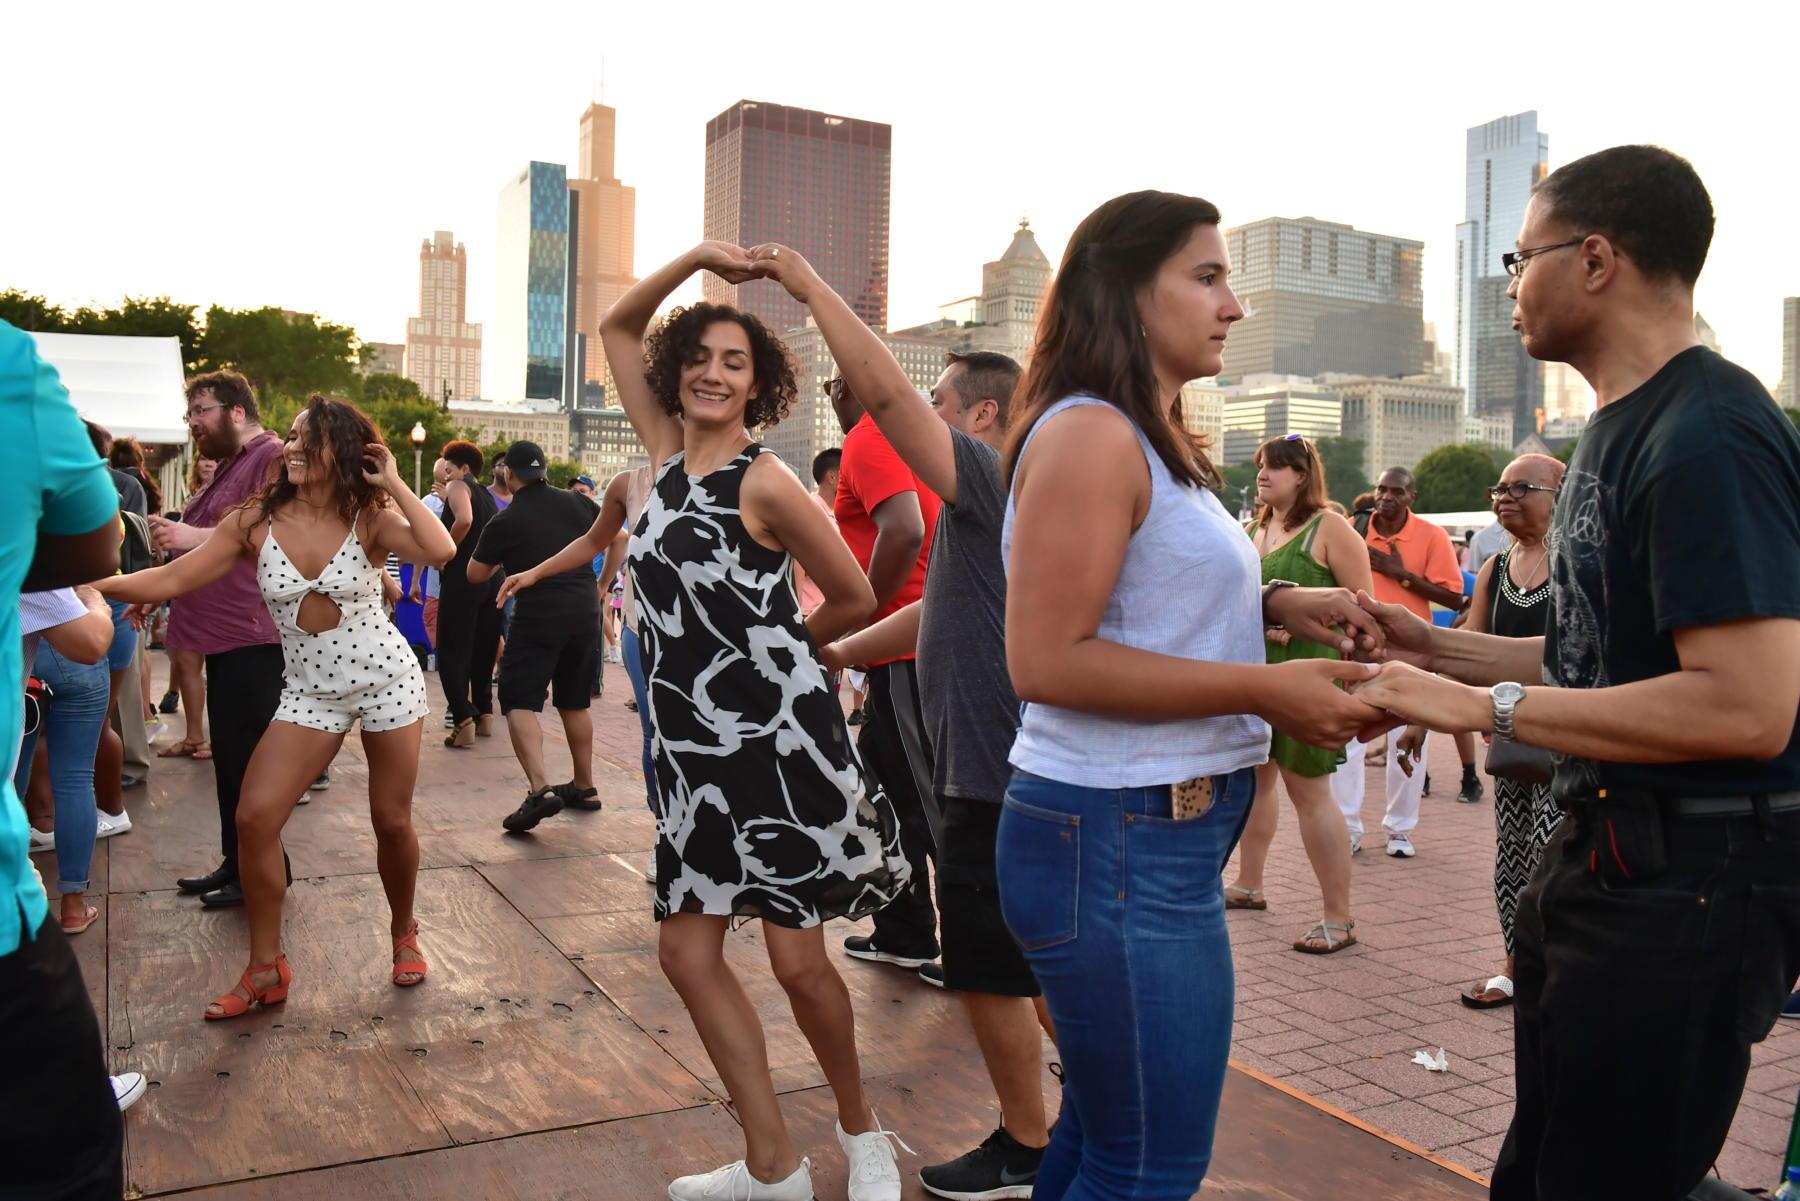 Summer Dance at Taste of Chicago